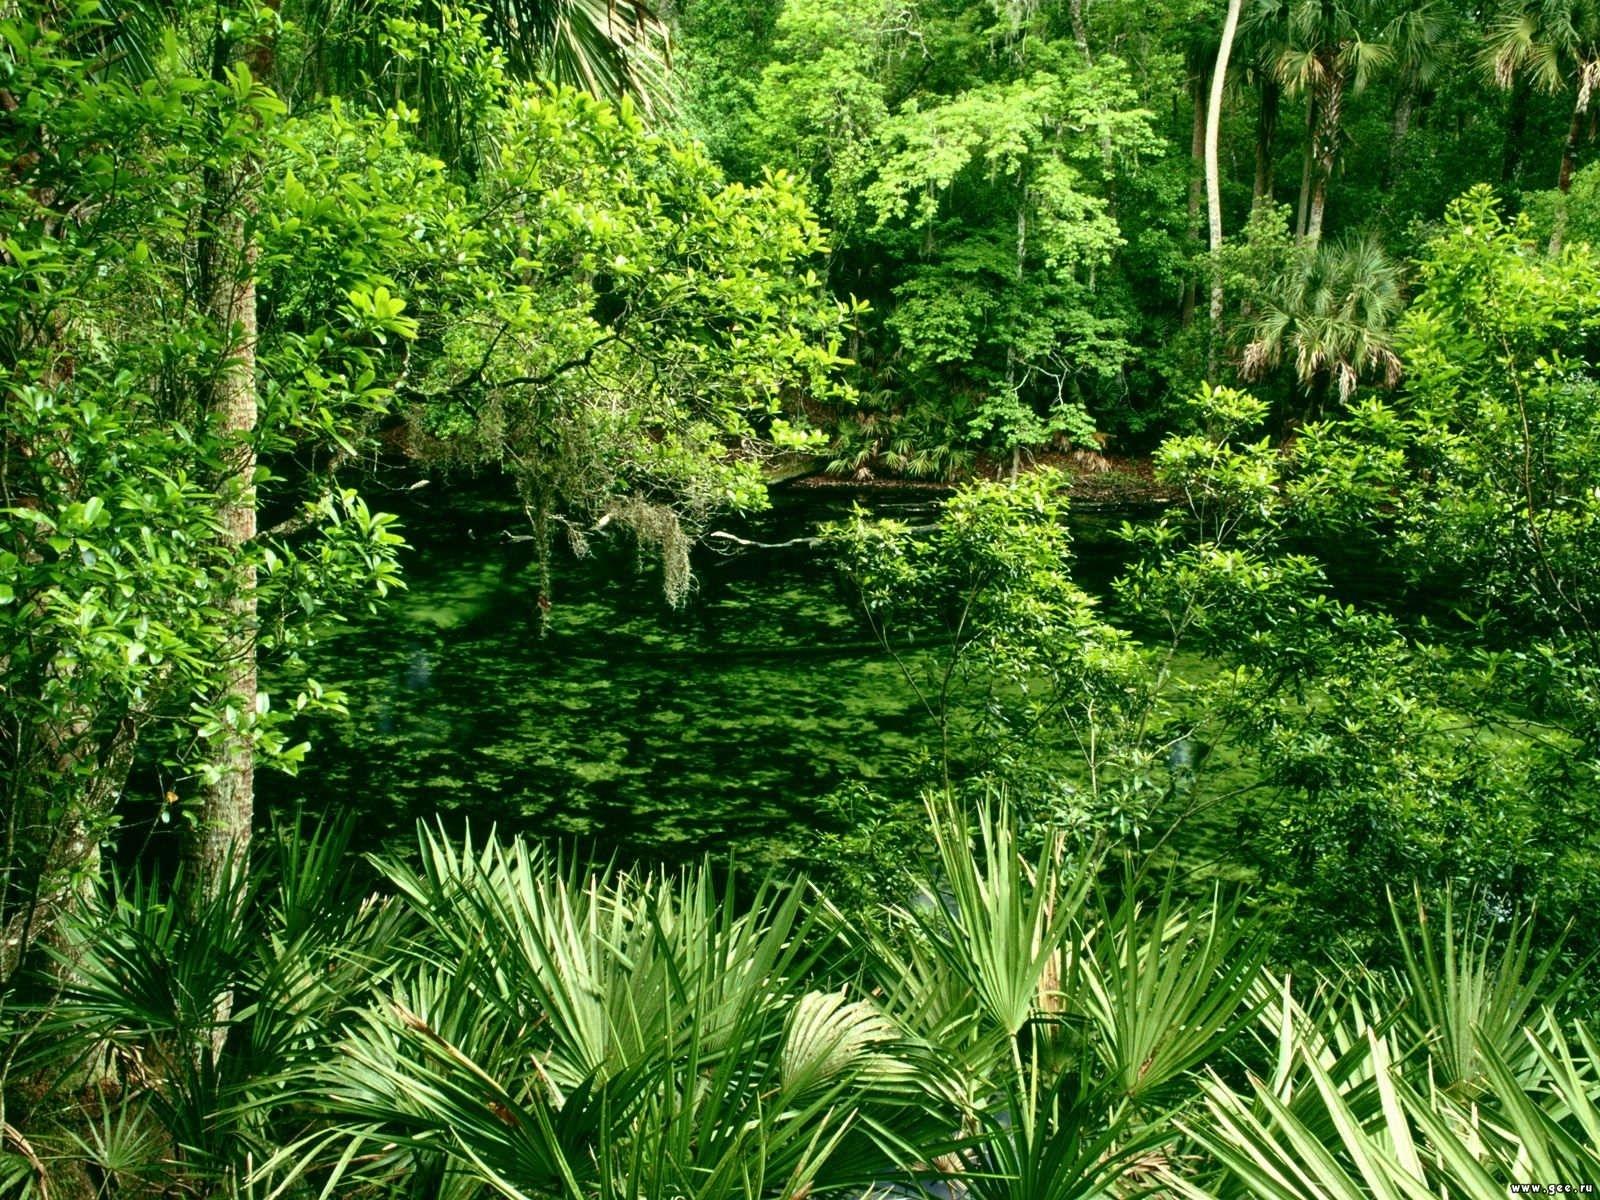 Download mobile wallpaper Trees, Plants, Landscape for free.